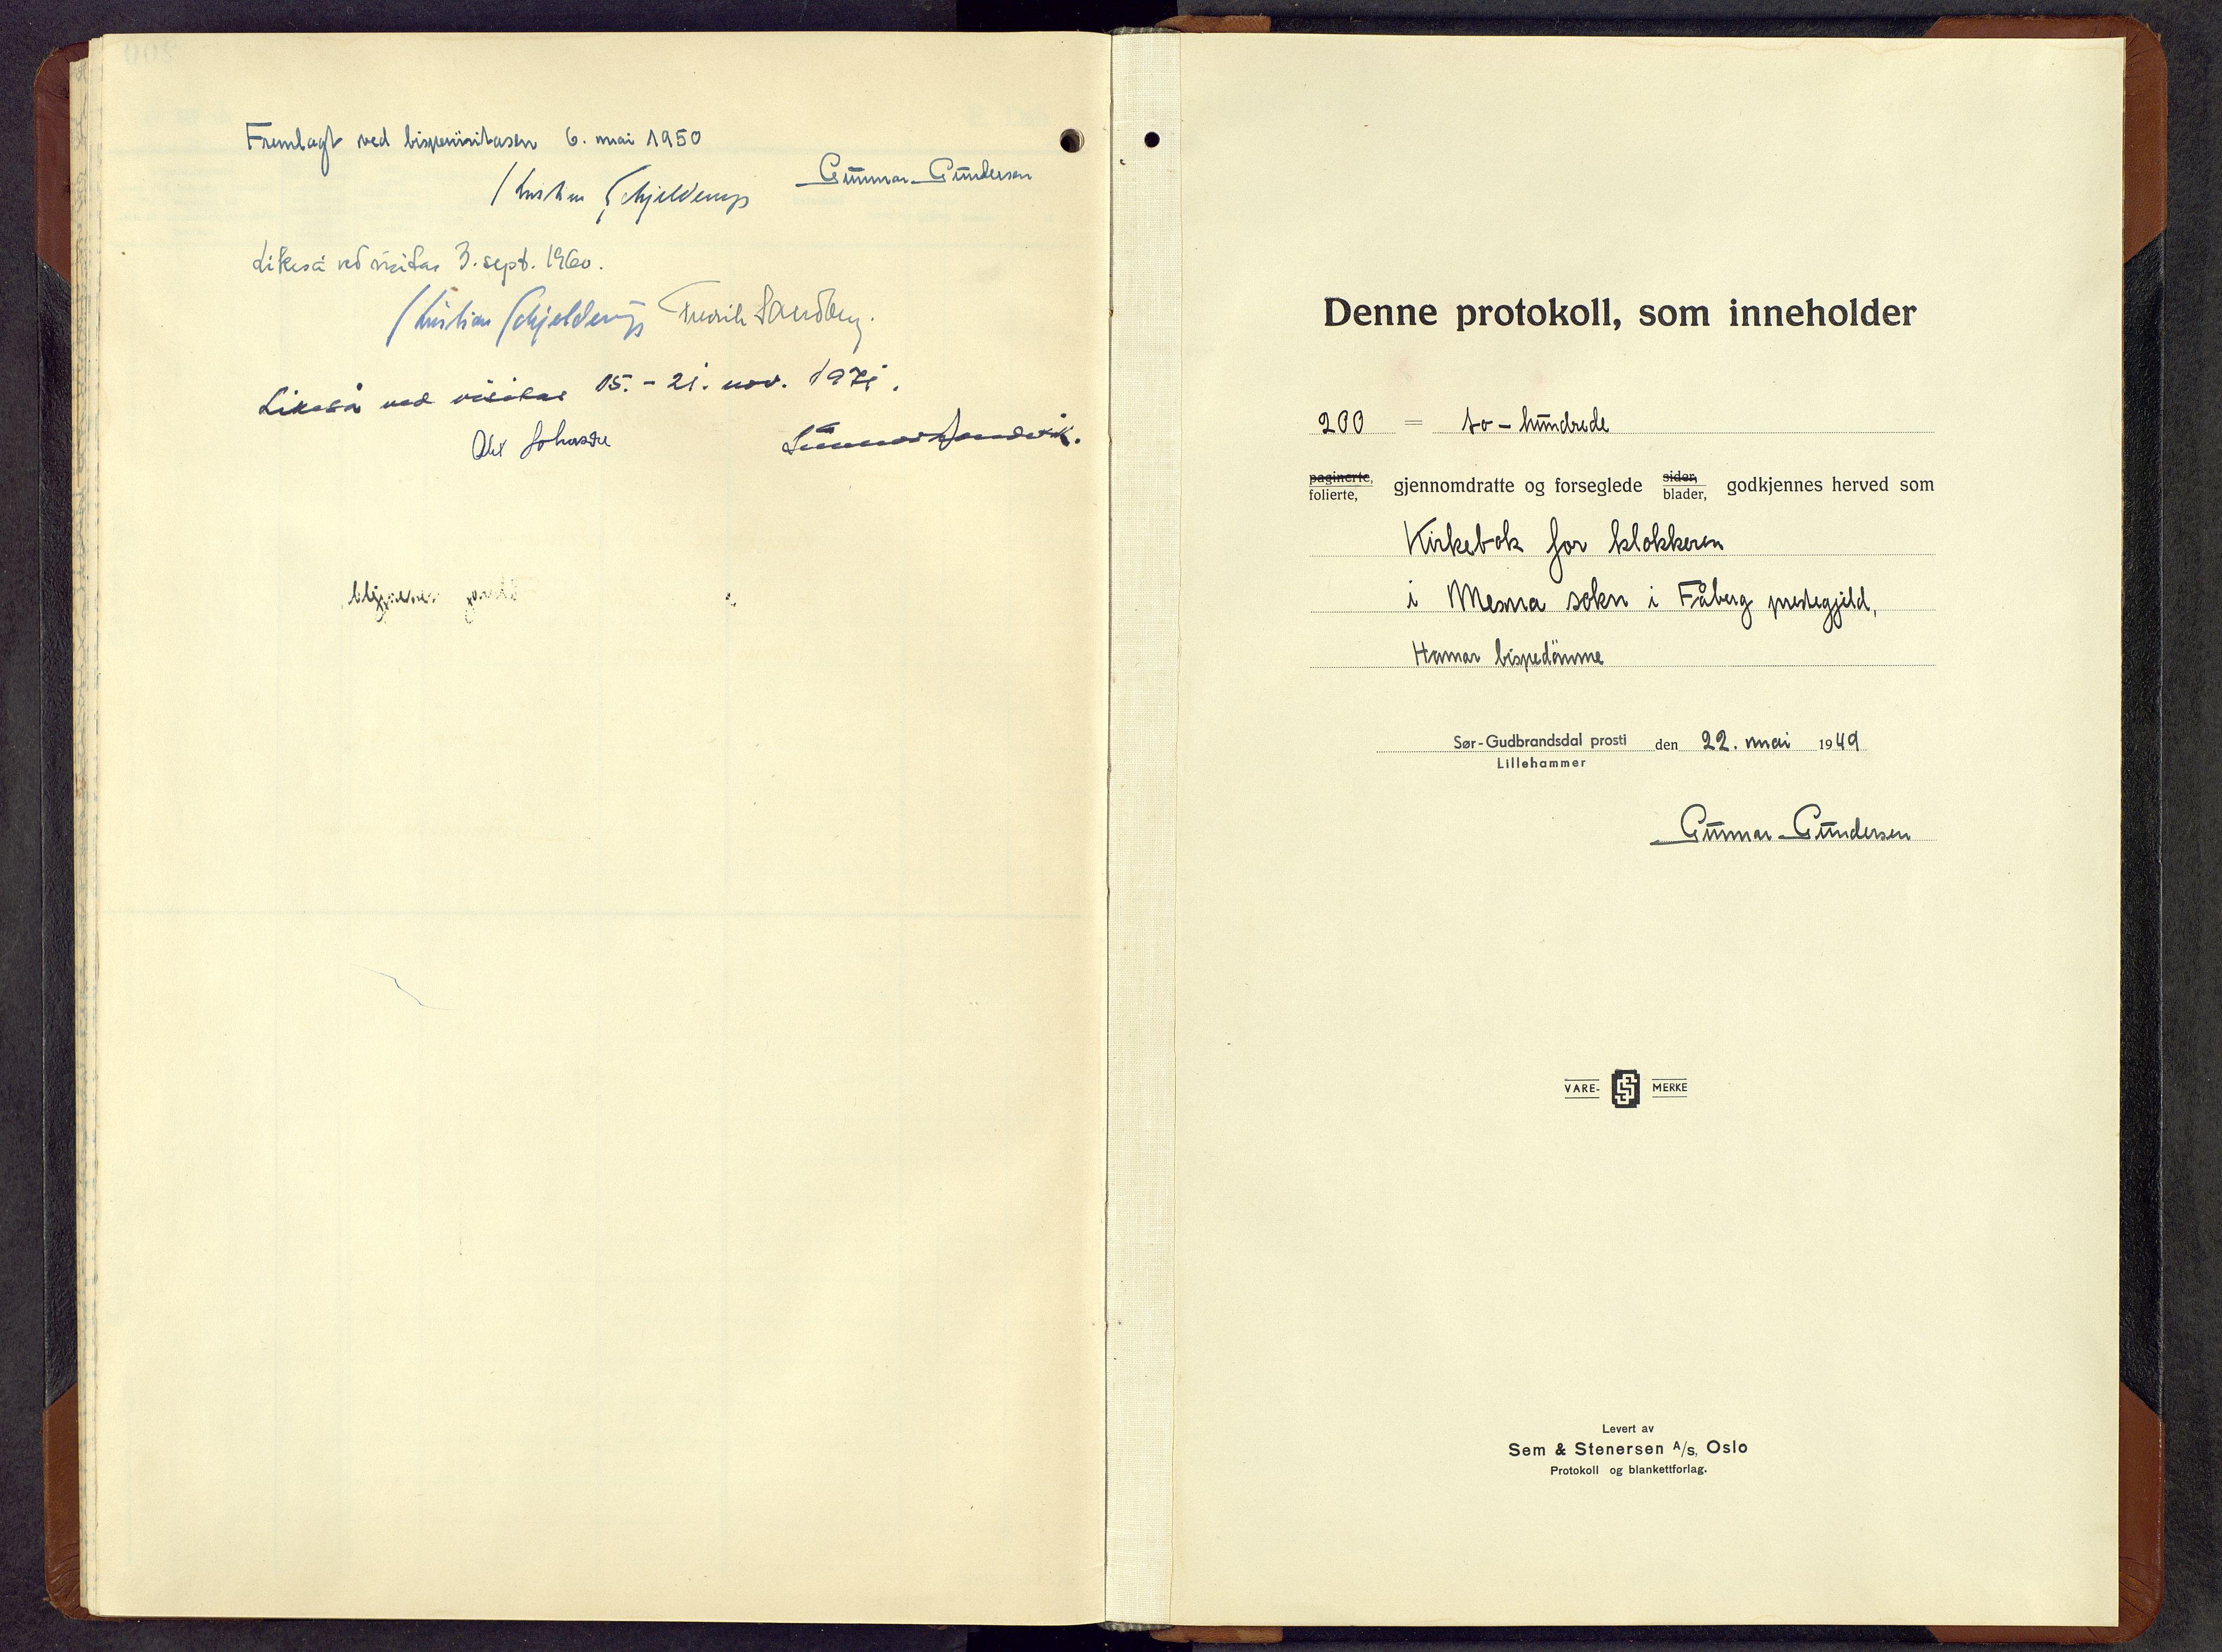 SAH, Fåberg prestekontor, H/Ha/Hab/L0019: Parish register (copy) no. 19, 1949-1968